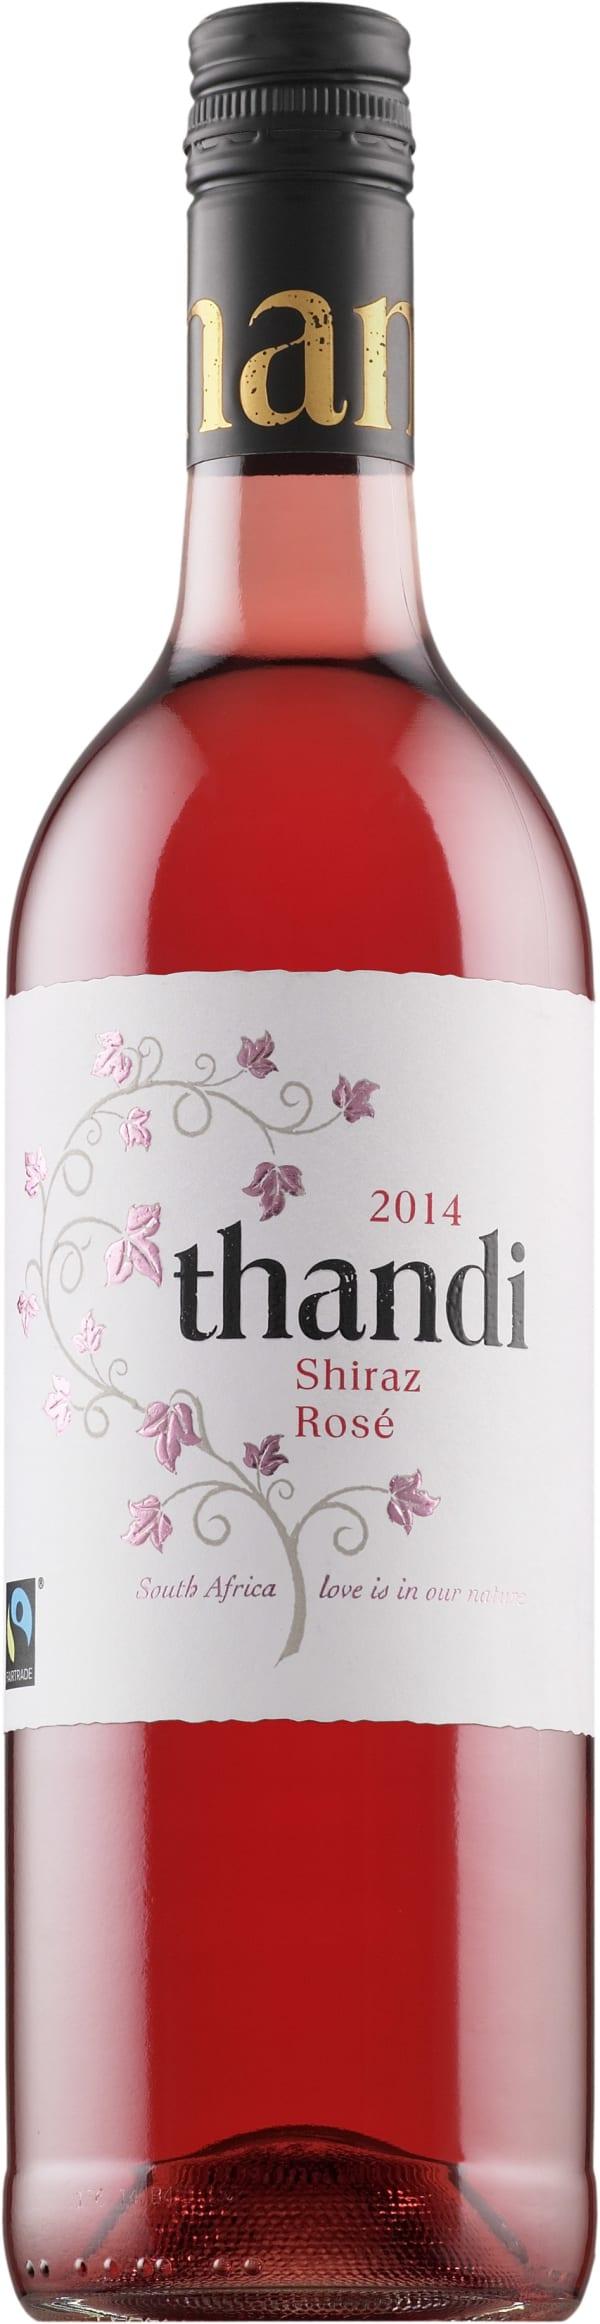 Thandi Shiraz Rosé 2016